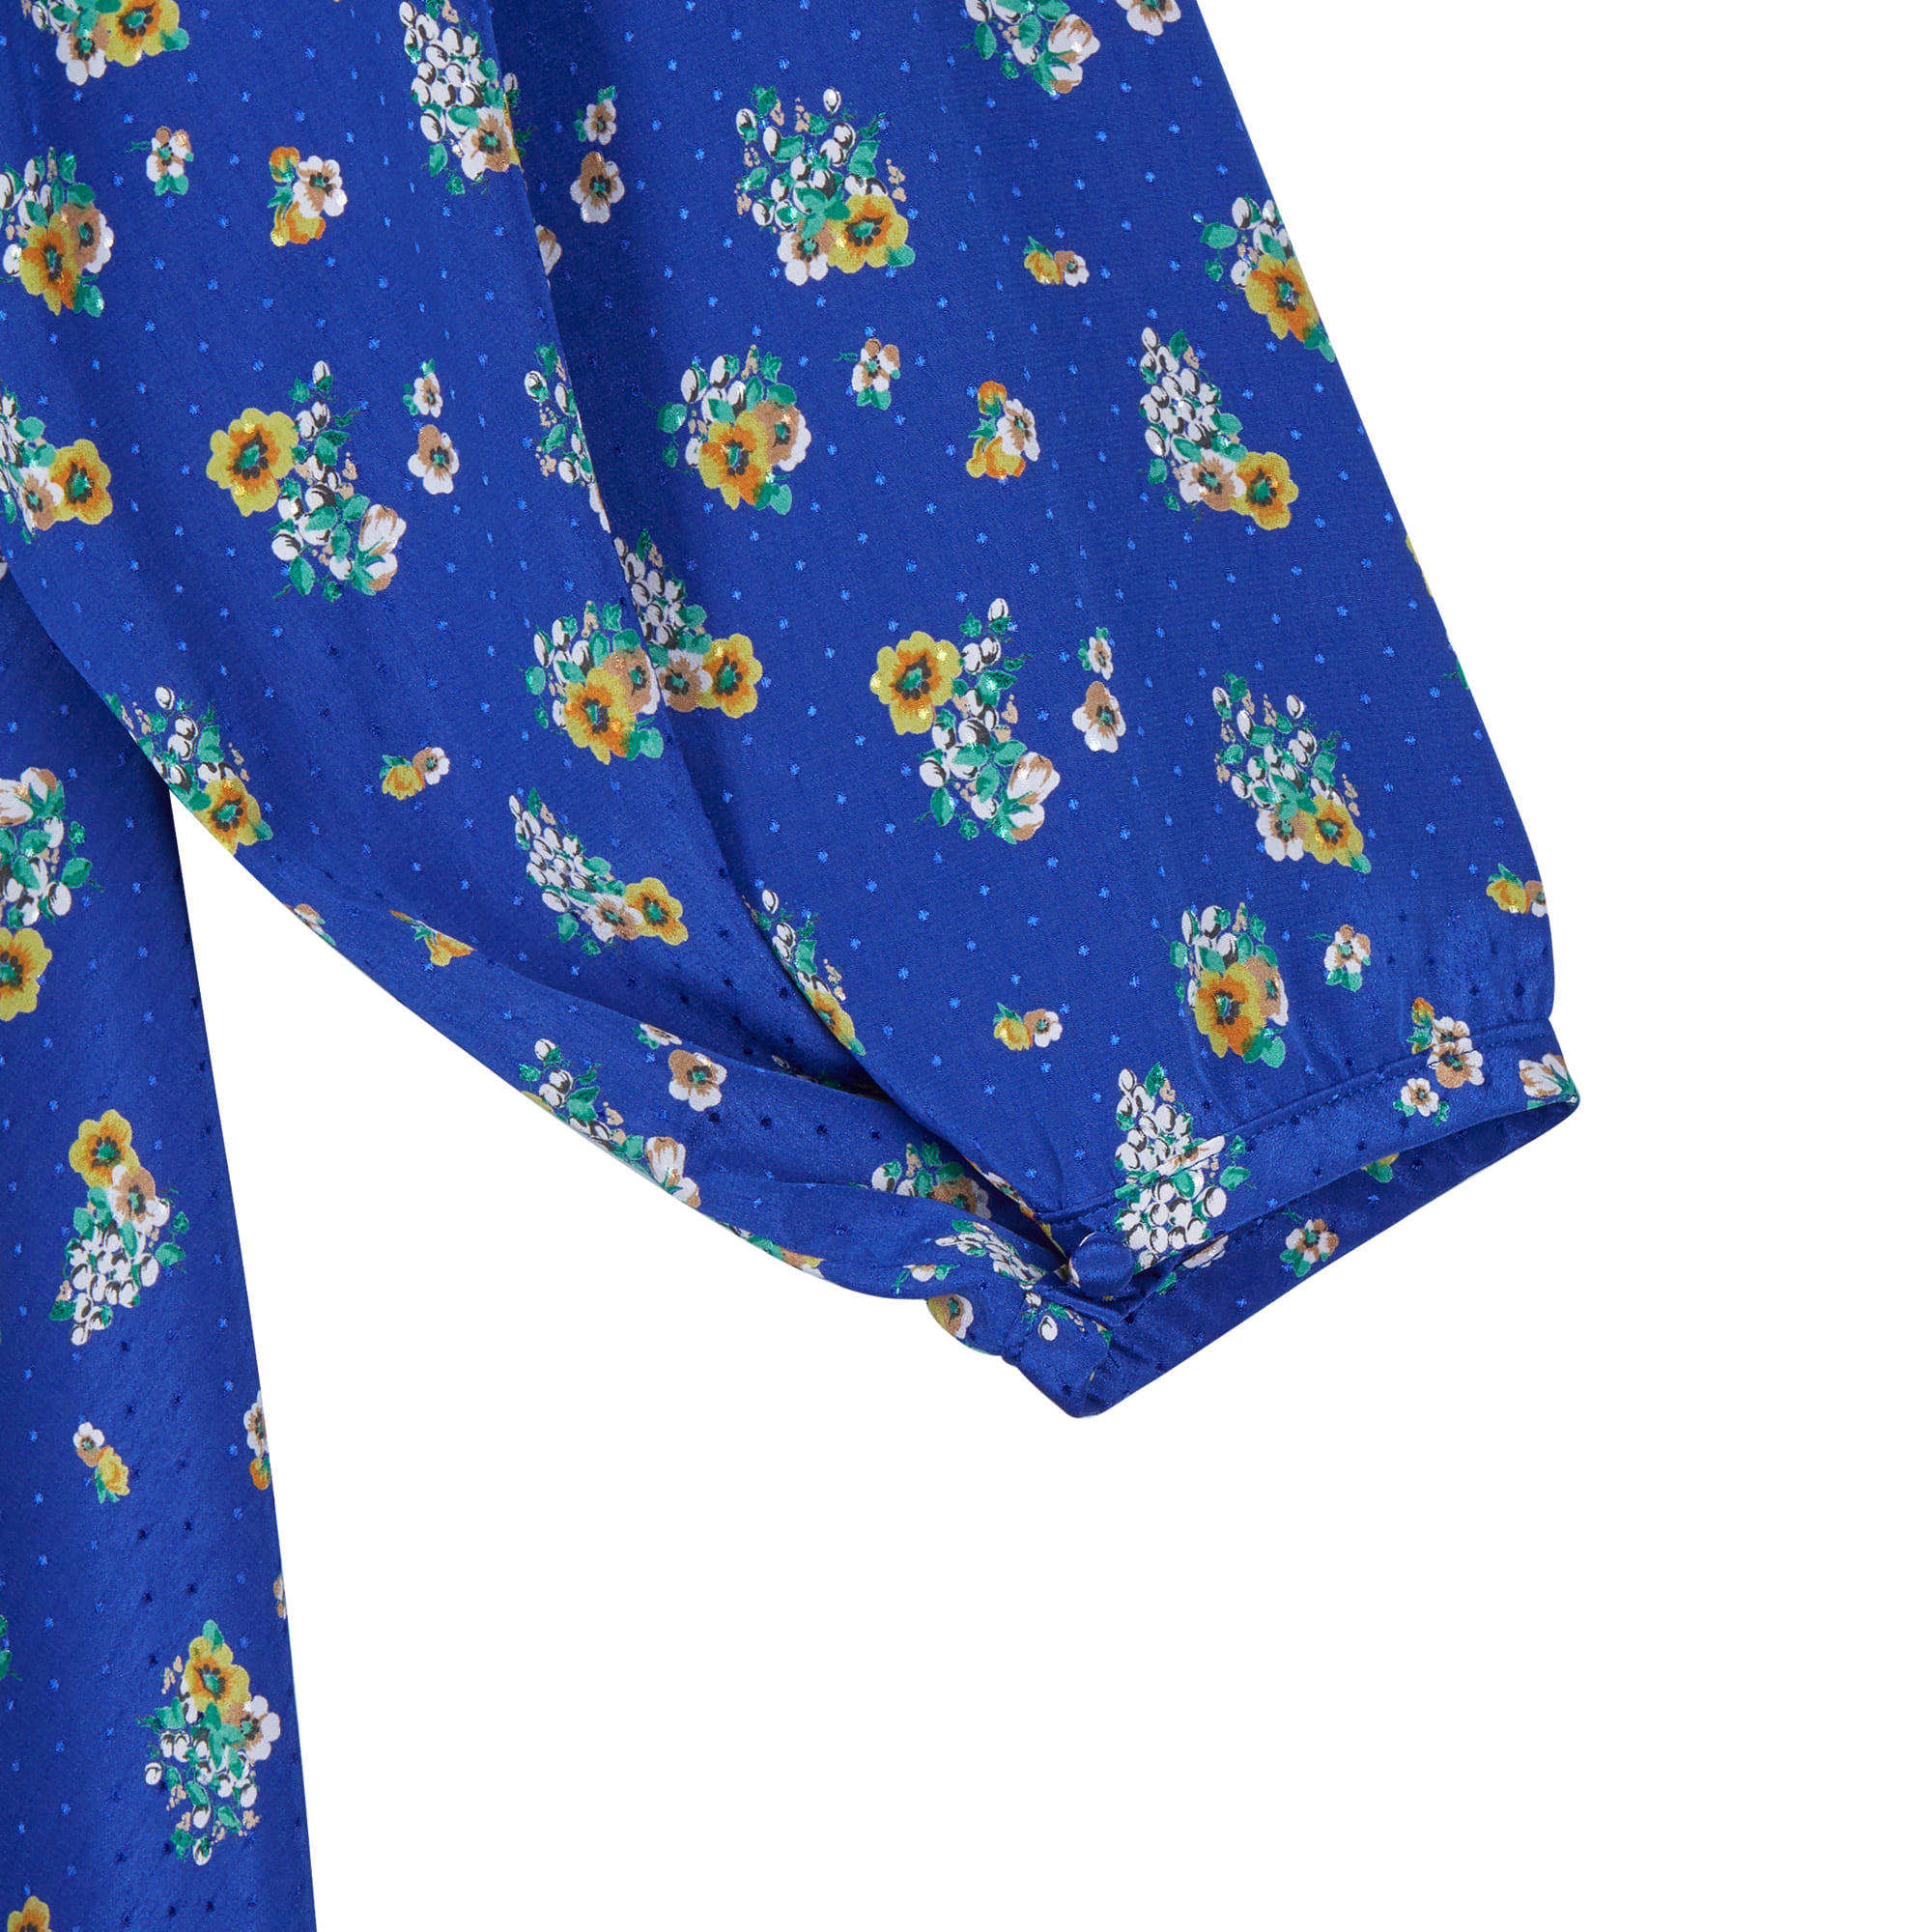 Vintage Floral Ruffle Dress Blue